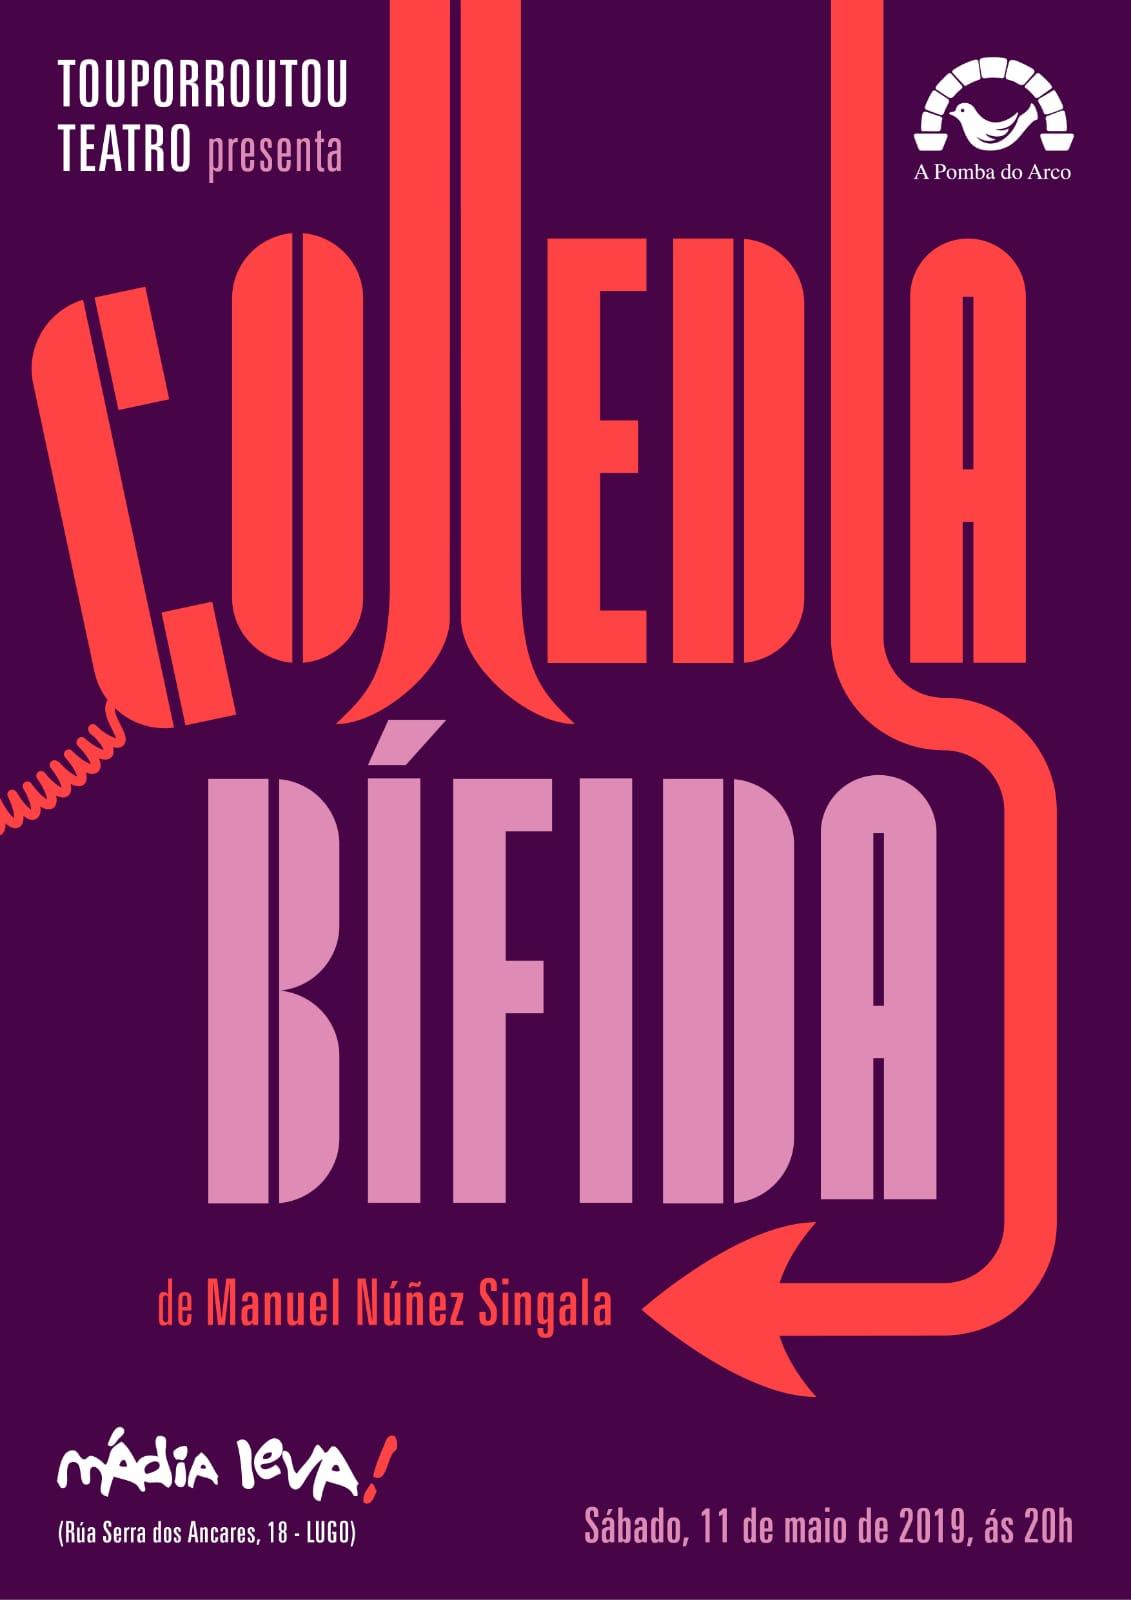 8c3109f81 Touporroutou apresenta Comedia Bífida BASENAME  o-11-de-maio-teatro DATE   Wed